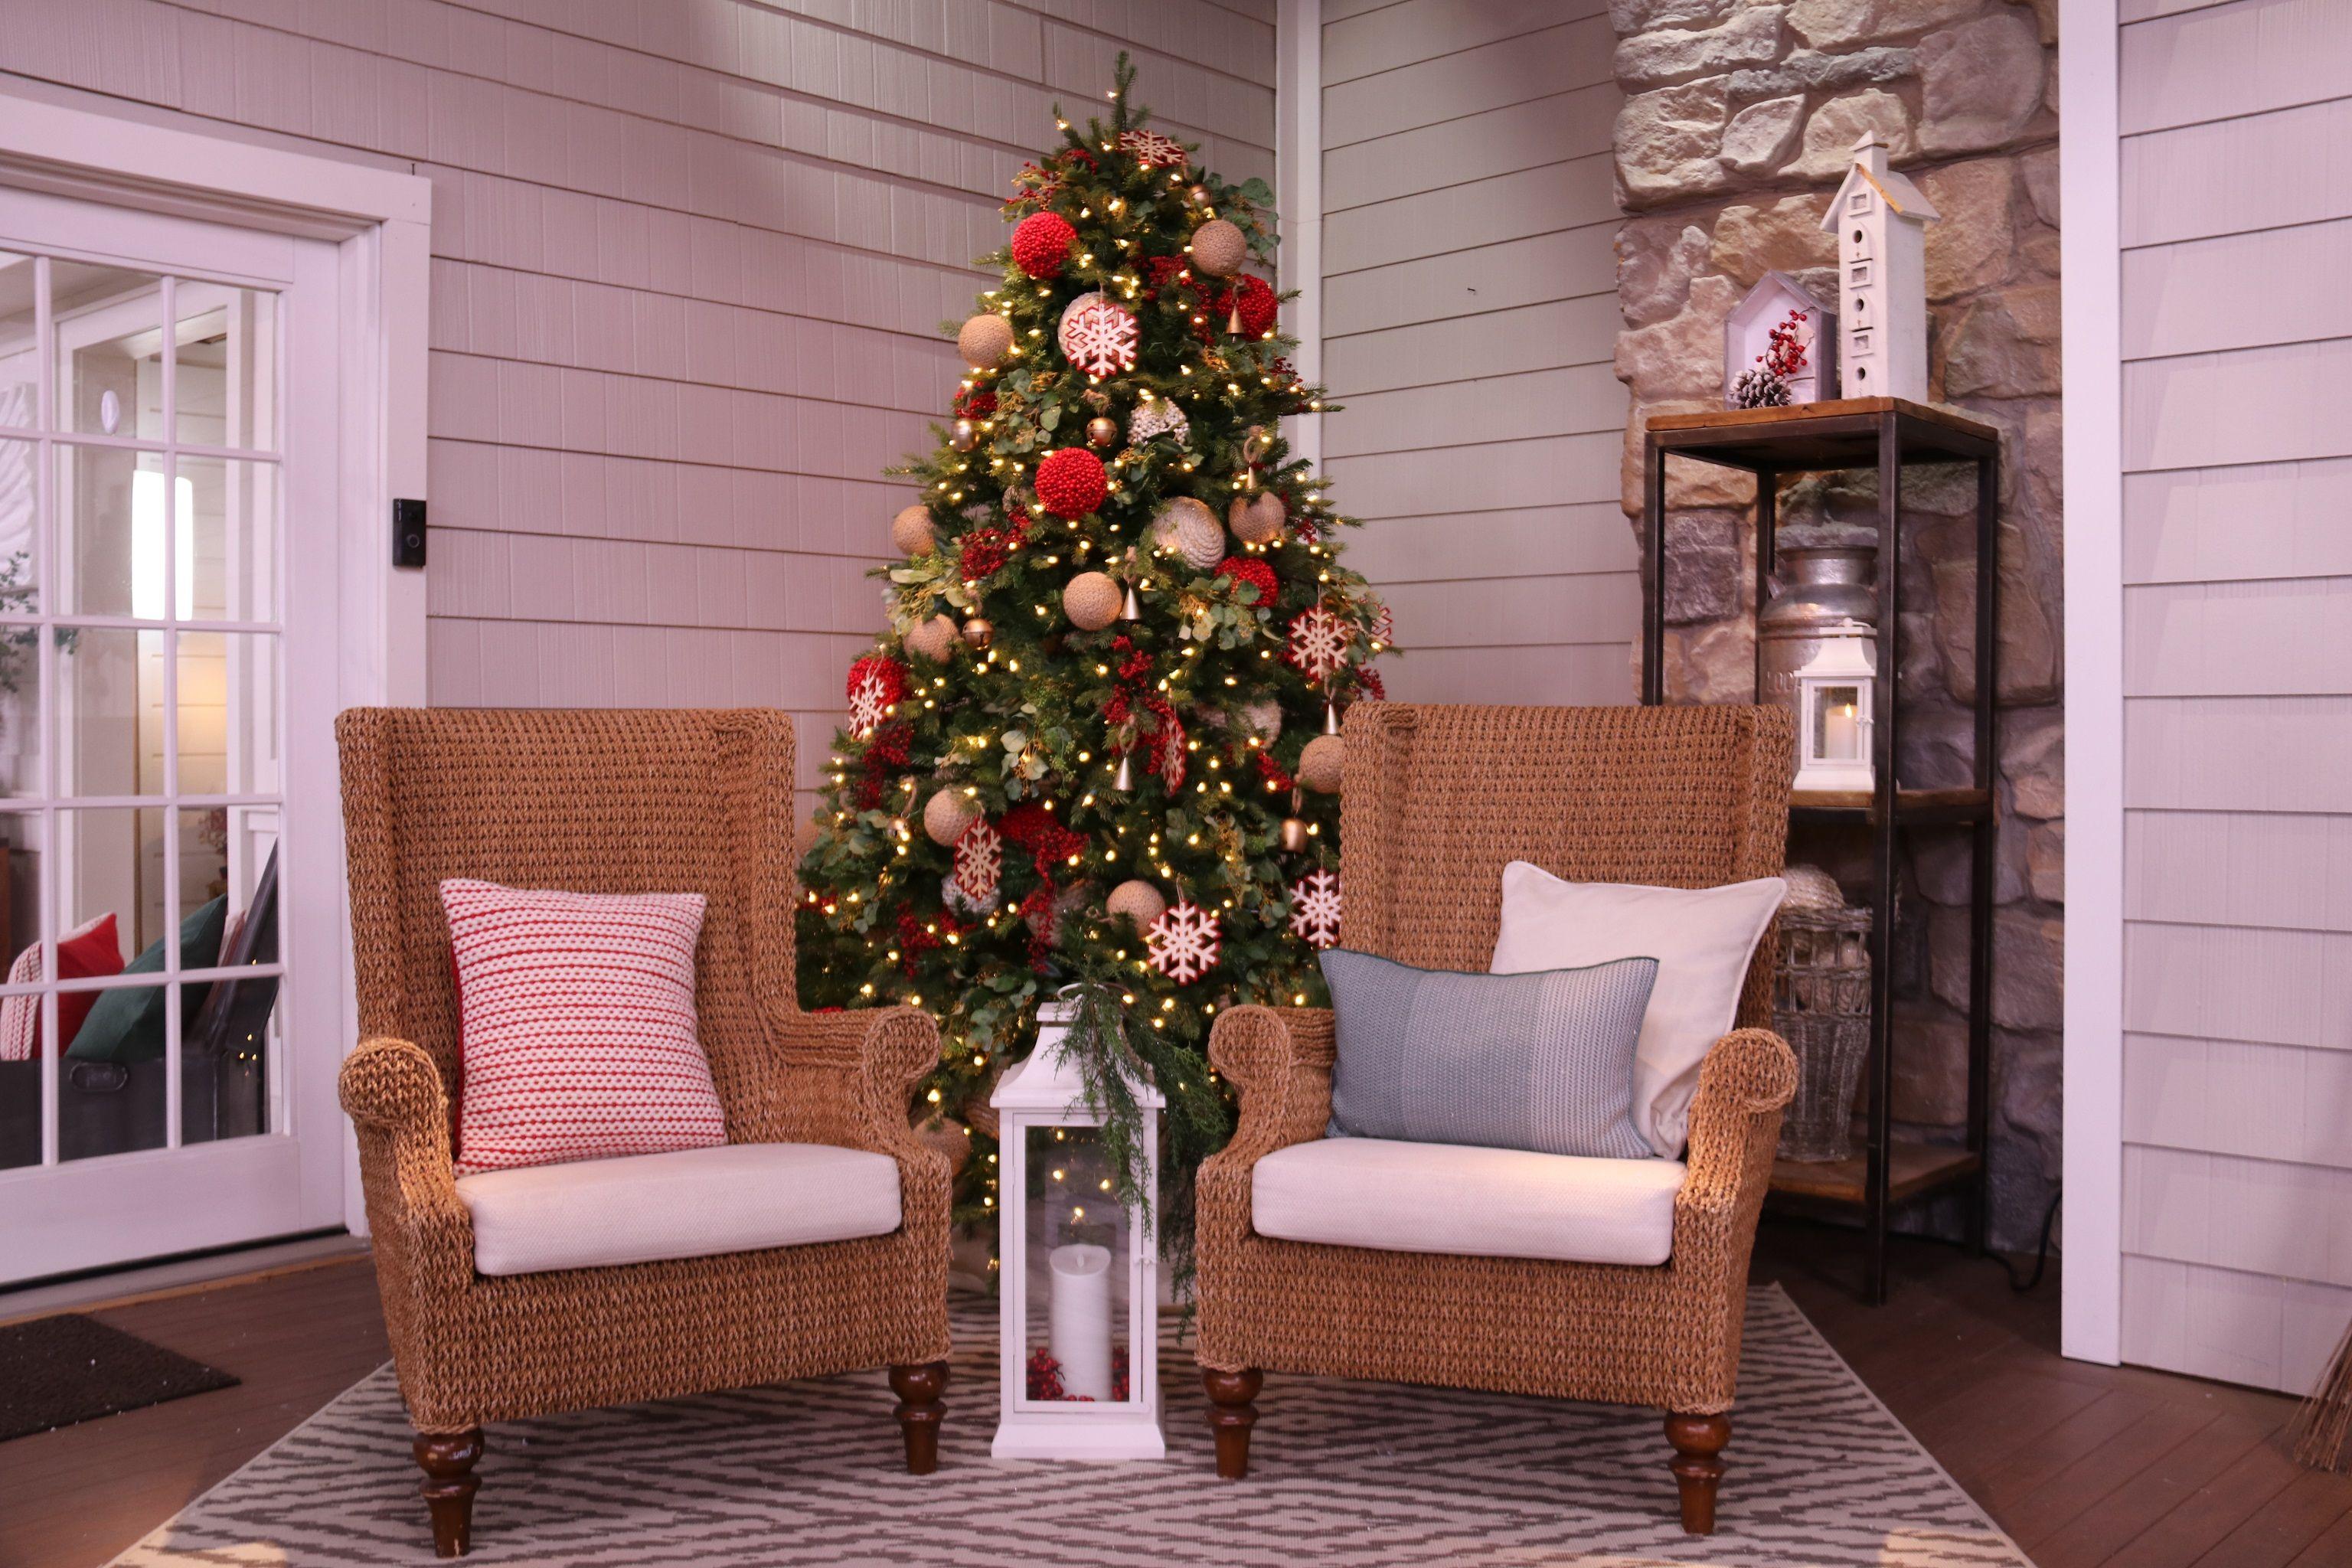 Tree and chairs.JPG